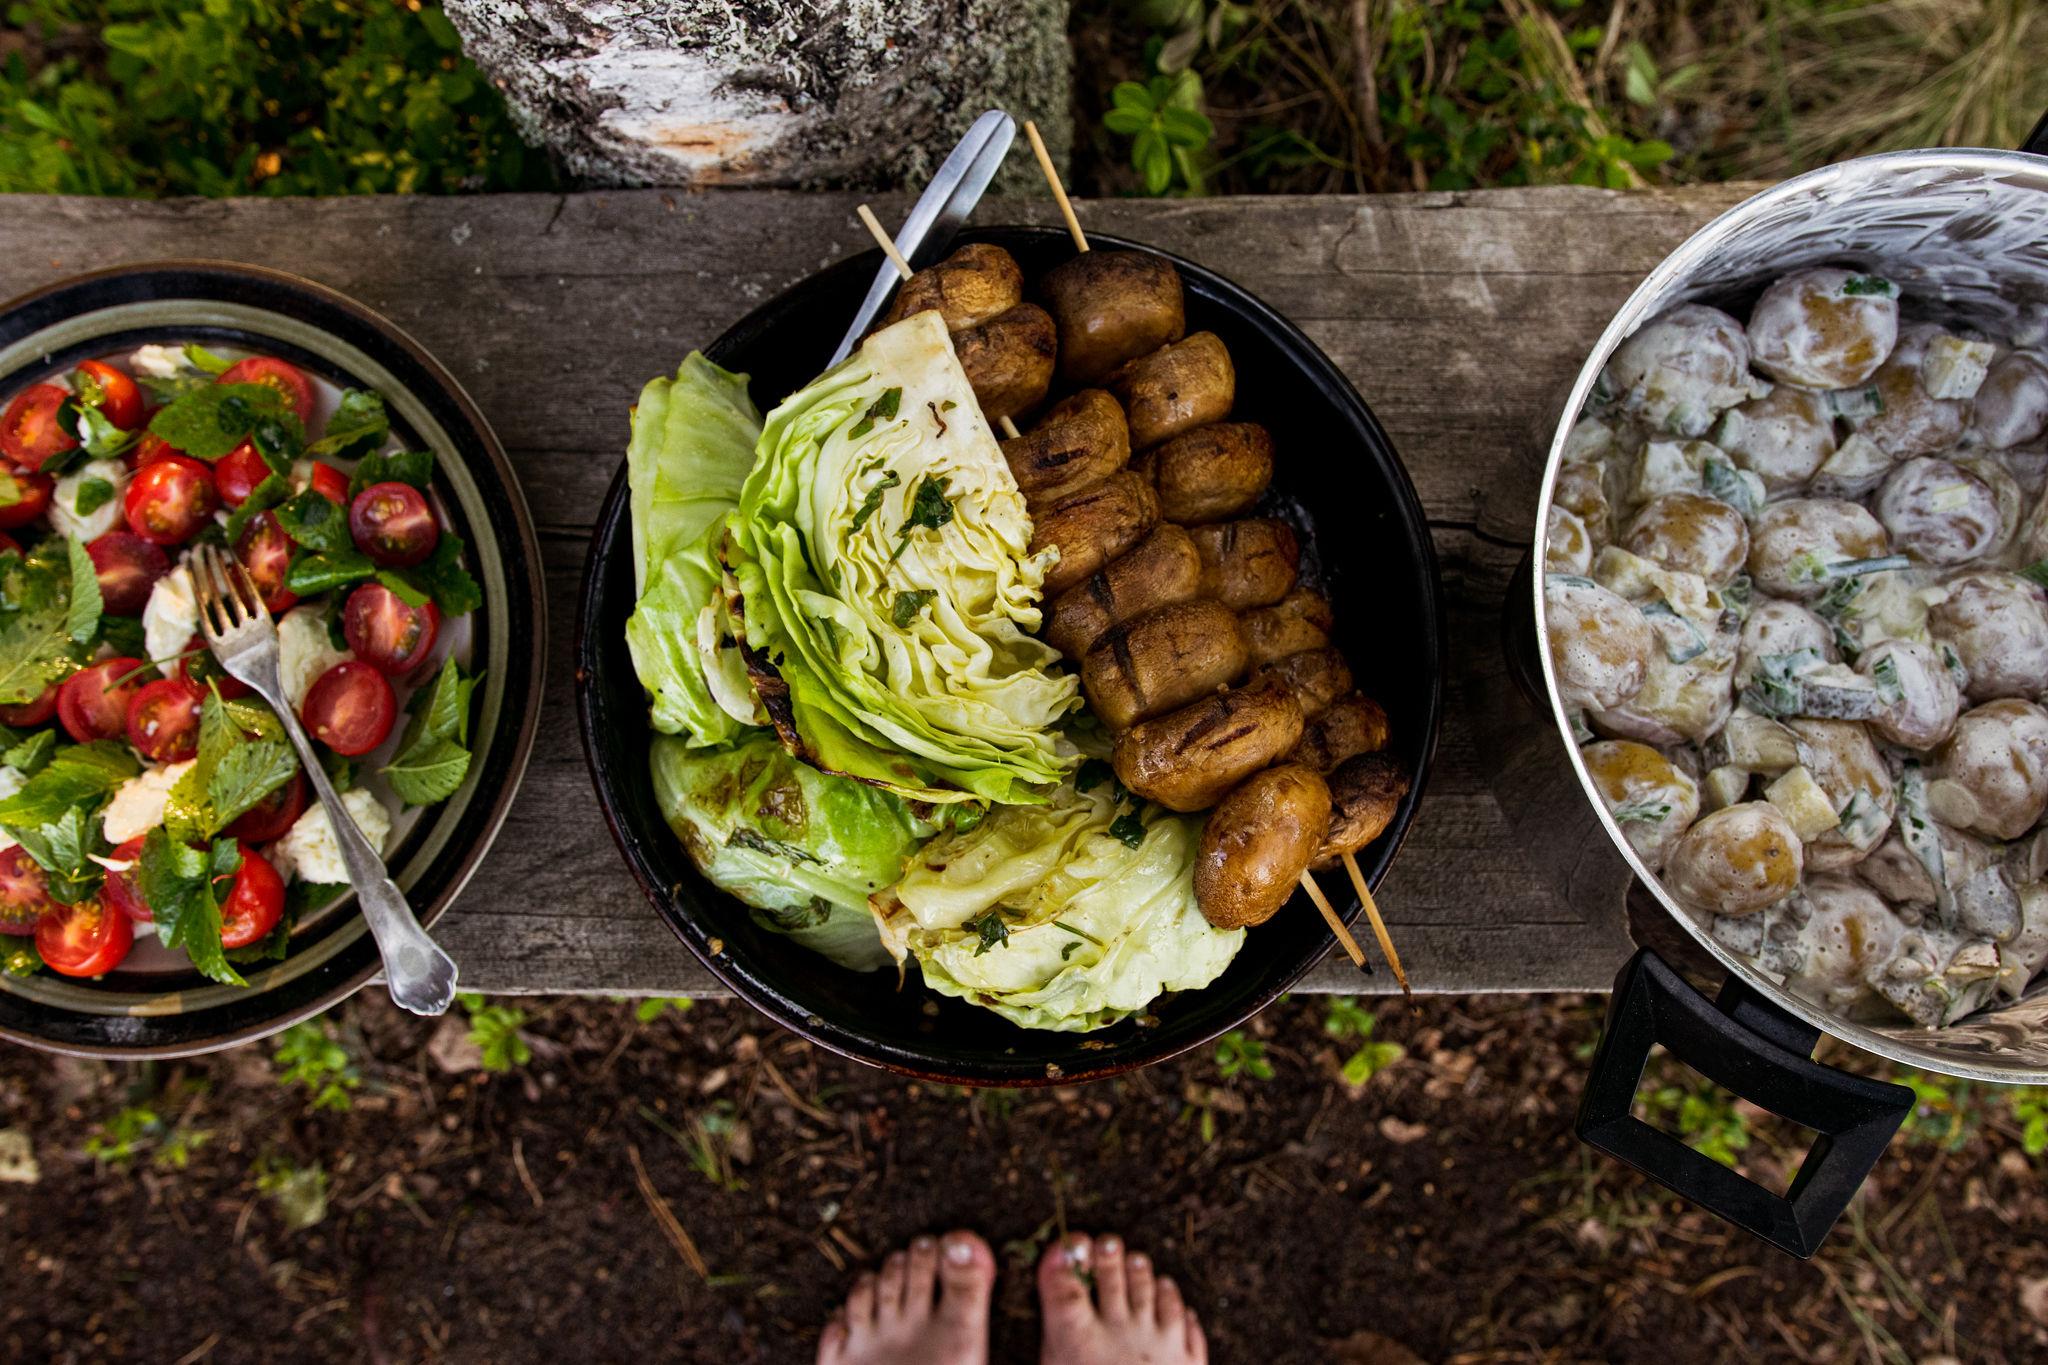 Grilled summer food